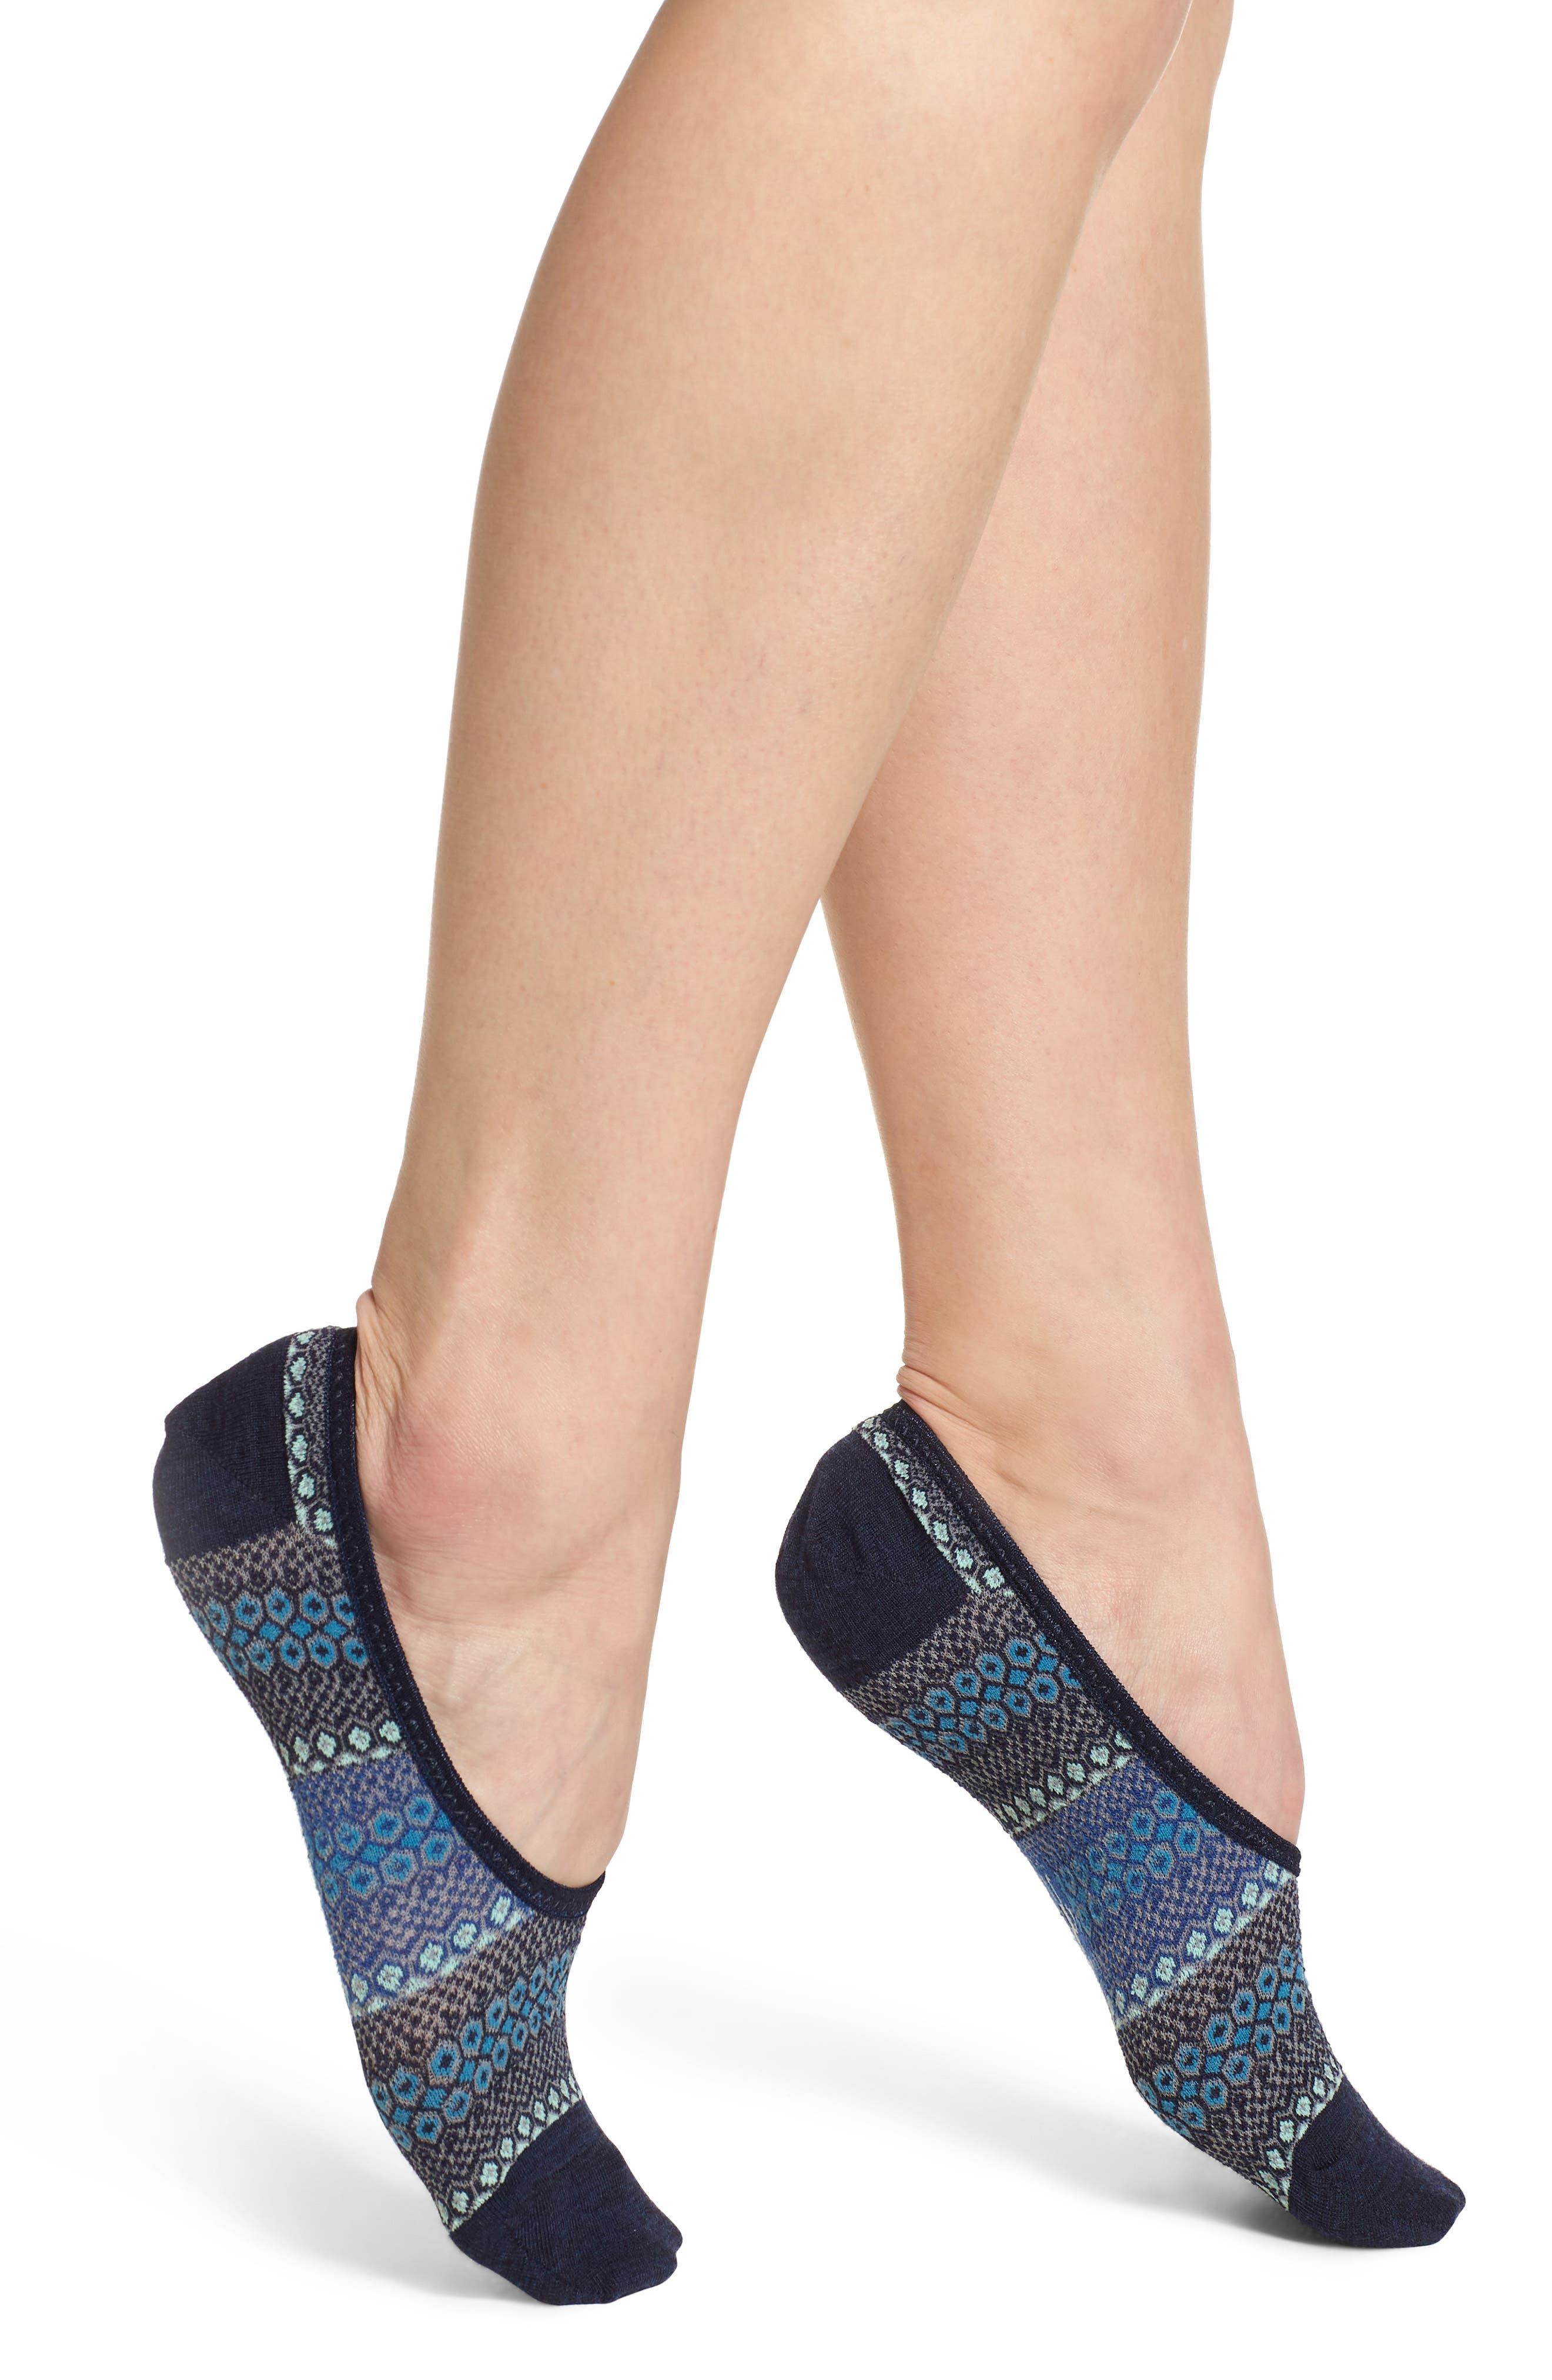 Beyond The Hive Hide & Seek No-Show Socks,                         Main,                         color, Deep Navy Heather